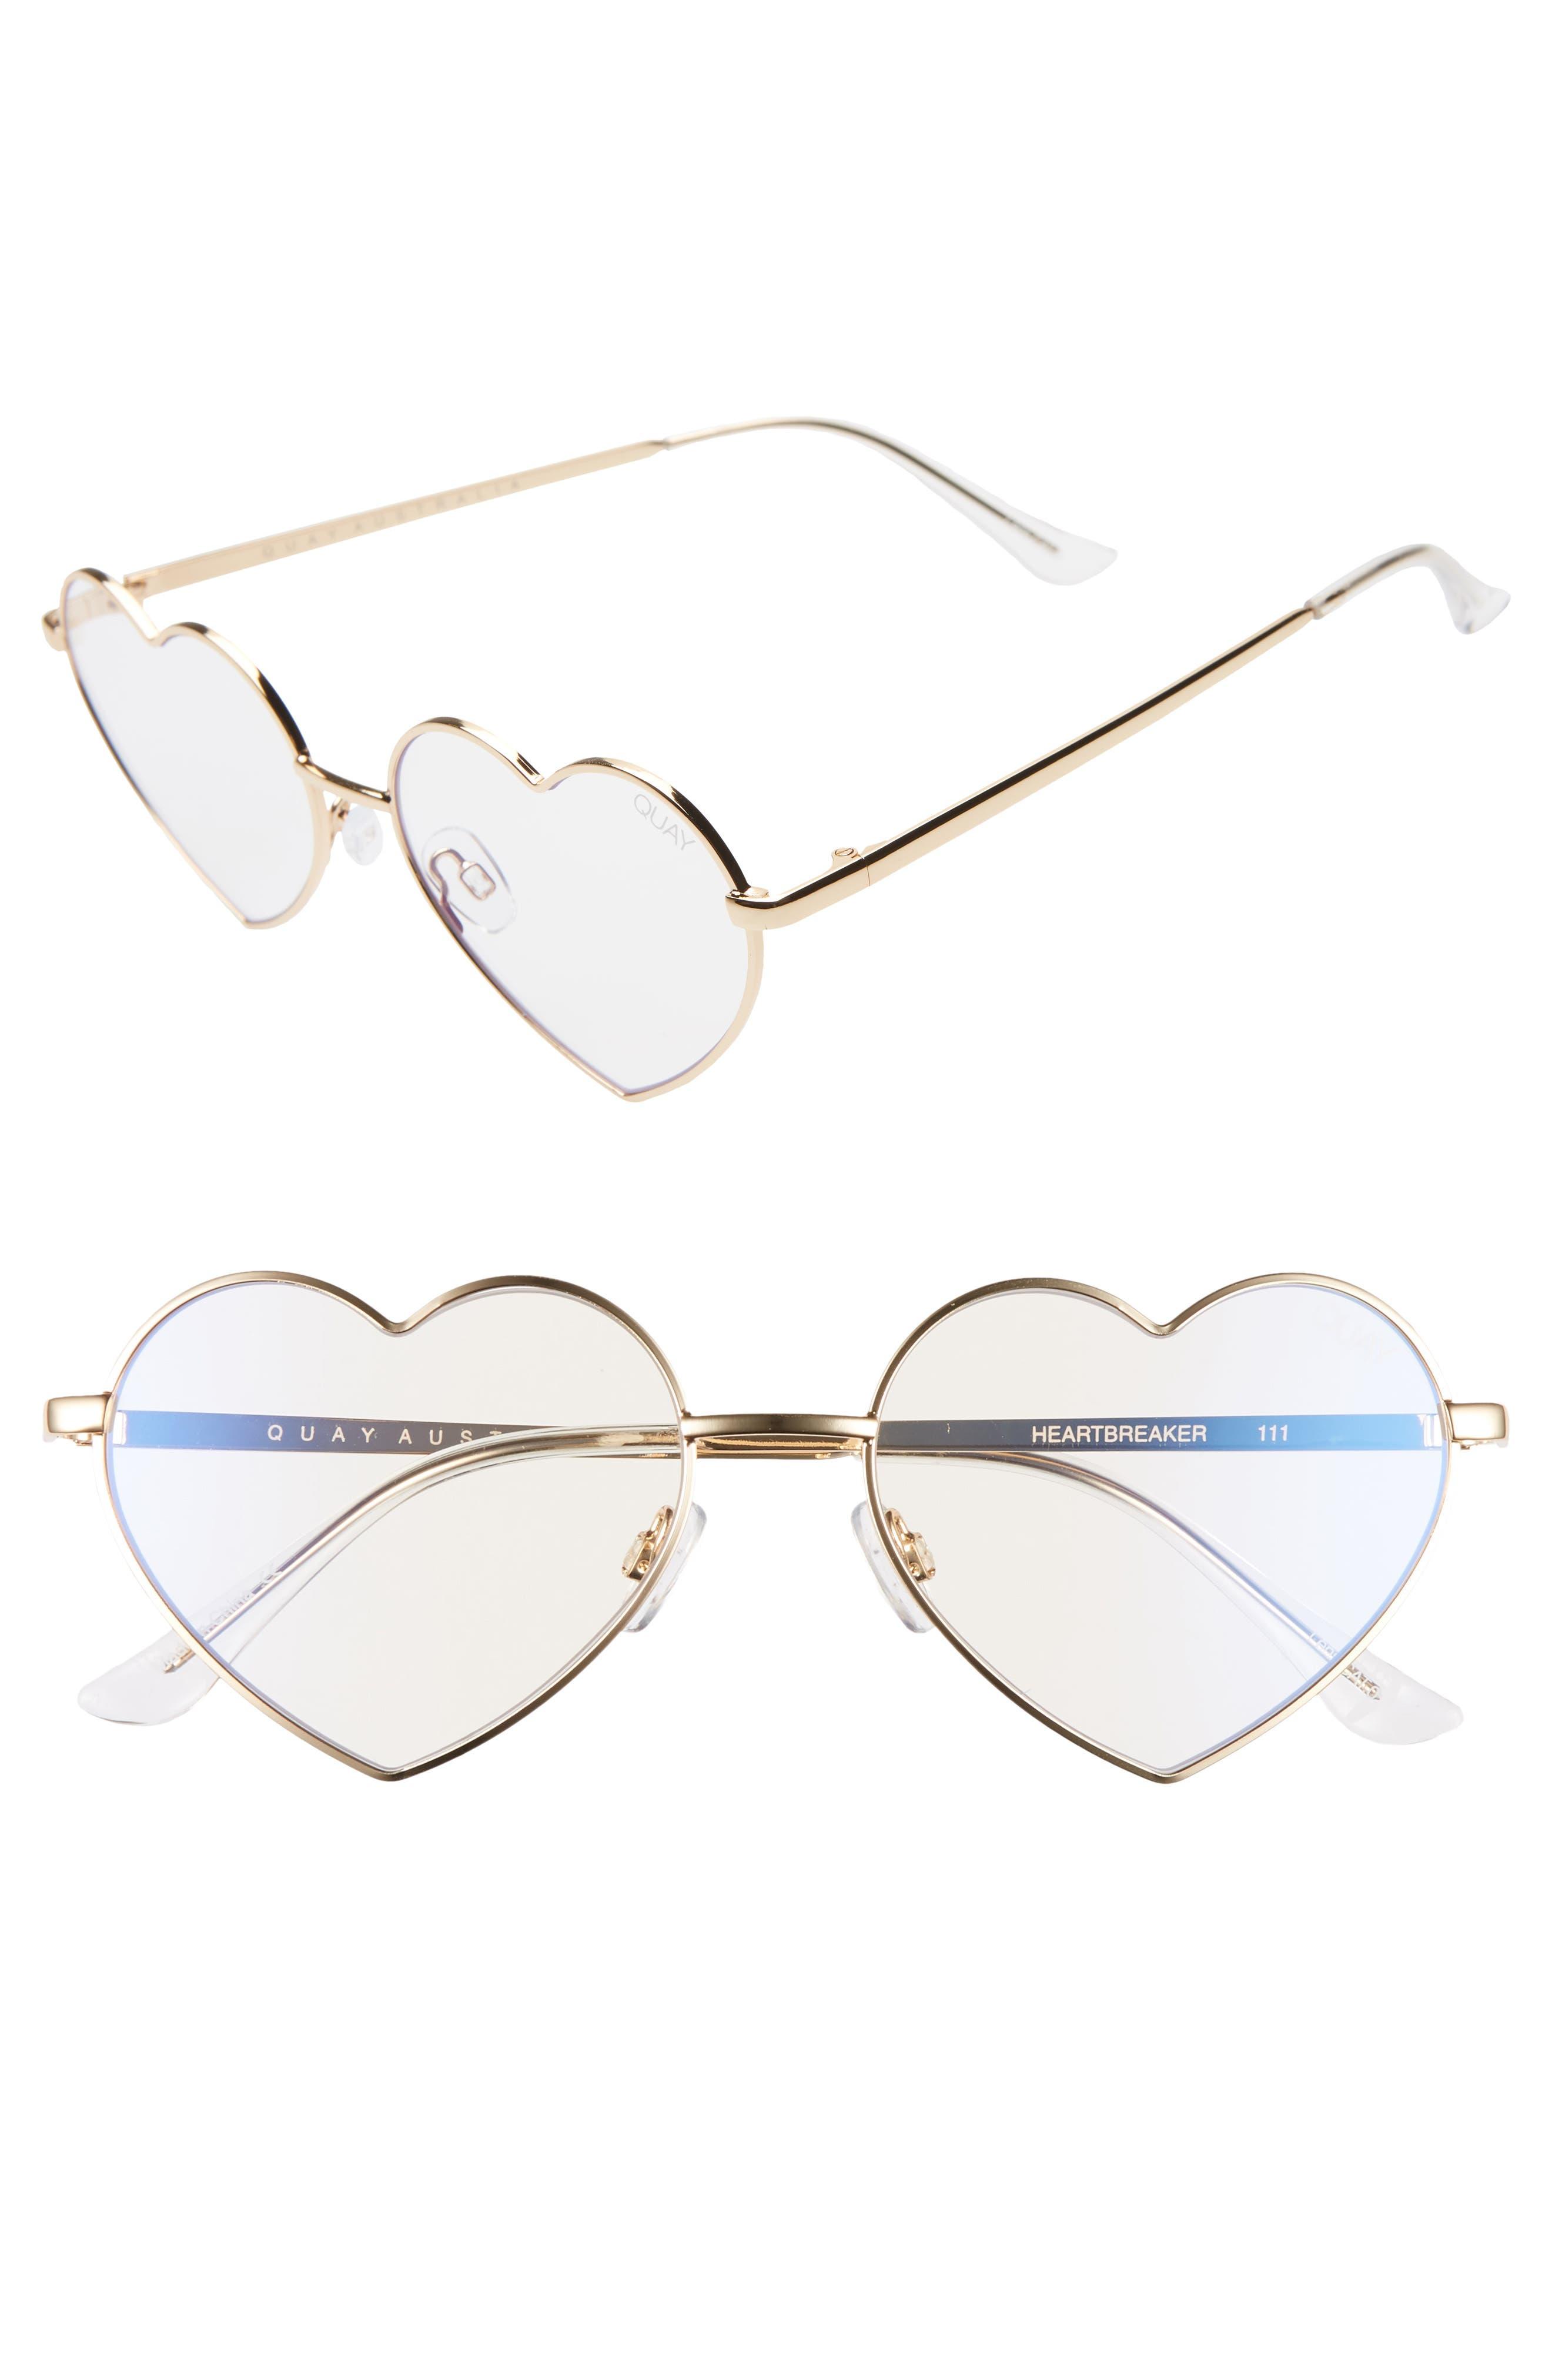 1960s Sunglasses   70s Sunglasses, 70s Glasses Womens Quay Australia Heartbreaker 54Mm Blue Light Blocking Glasses - $50.00 AT vintagedancer.com